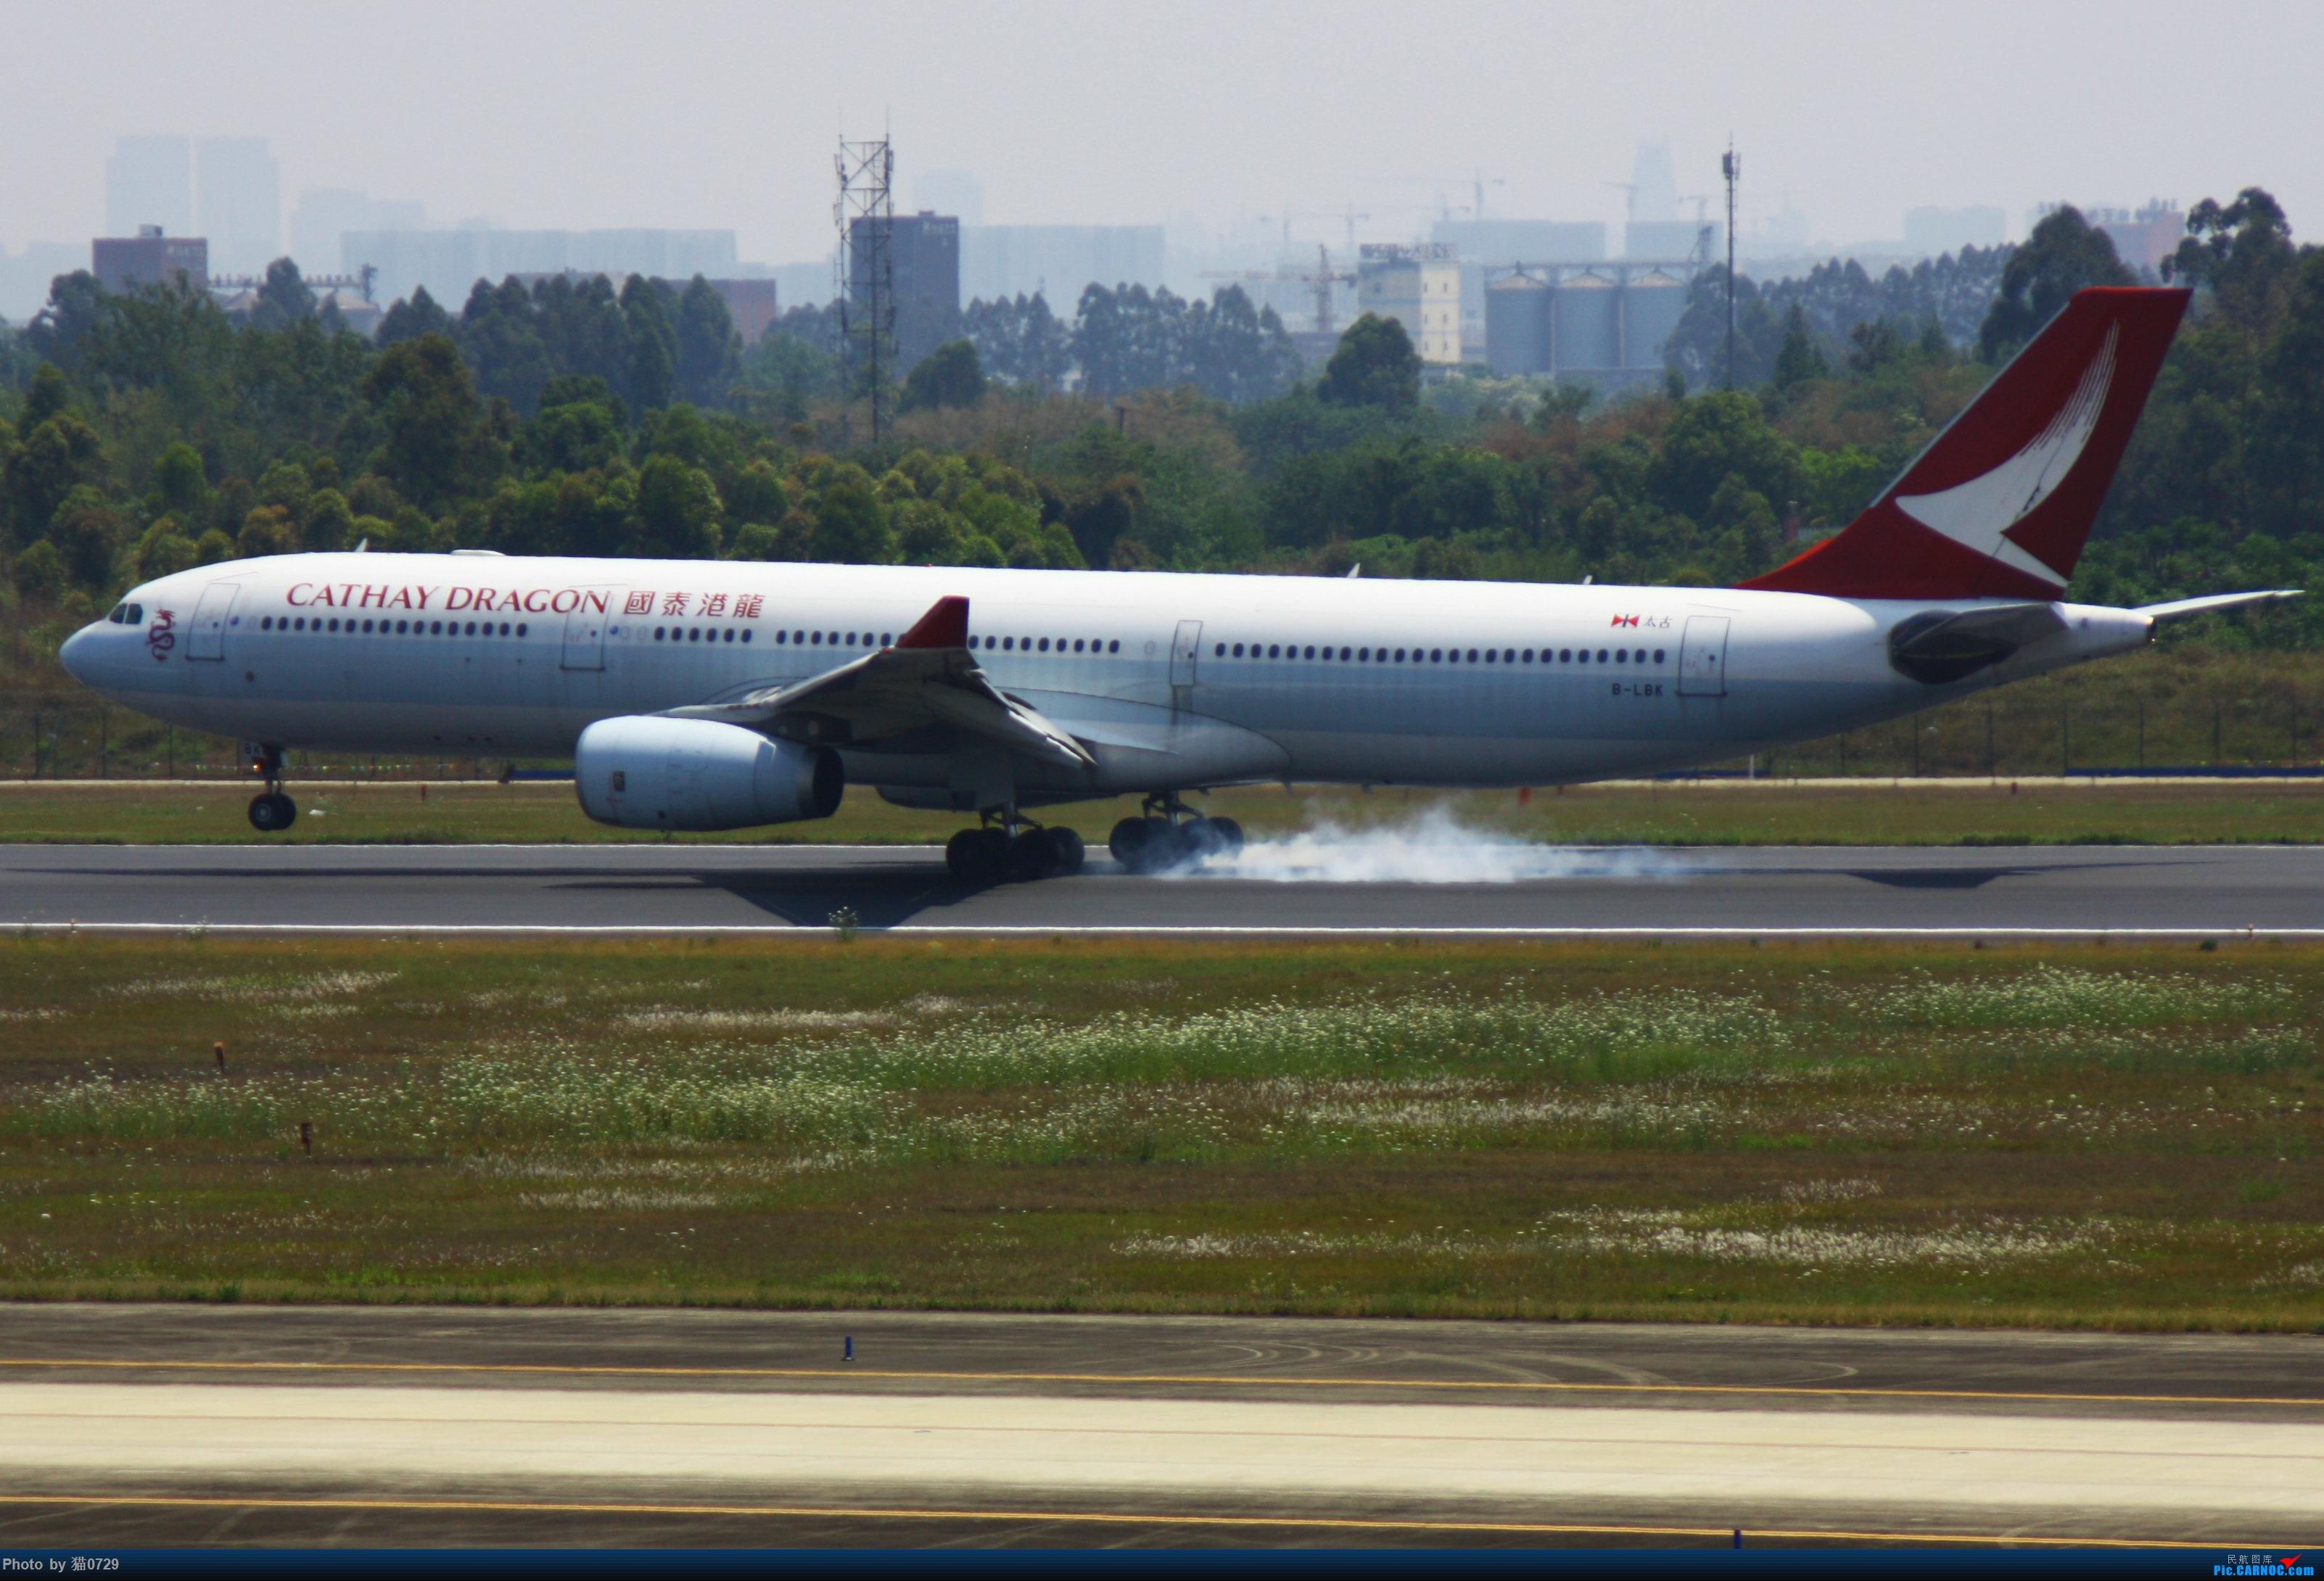 Re:[原创]跑道洞两右,气温三拐,六点五小时坚守双流 AIRBUS A330-300 B-LBK 中国成都双流国际机场